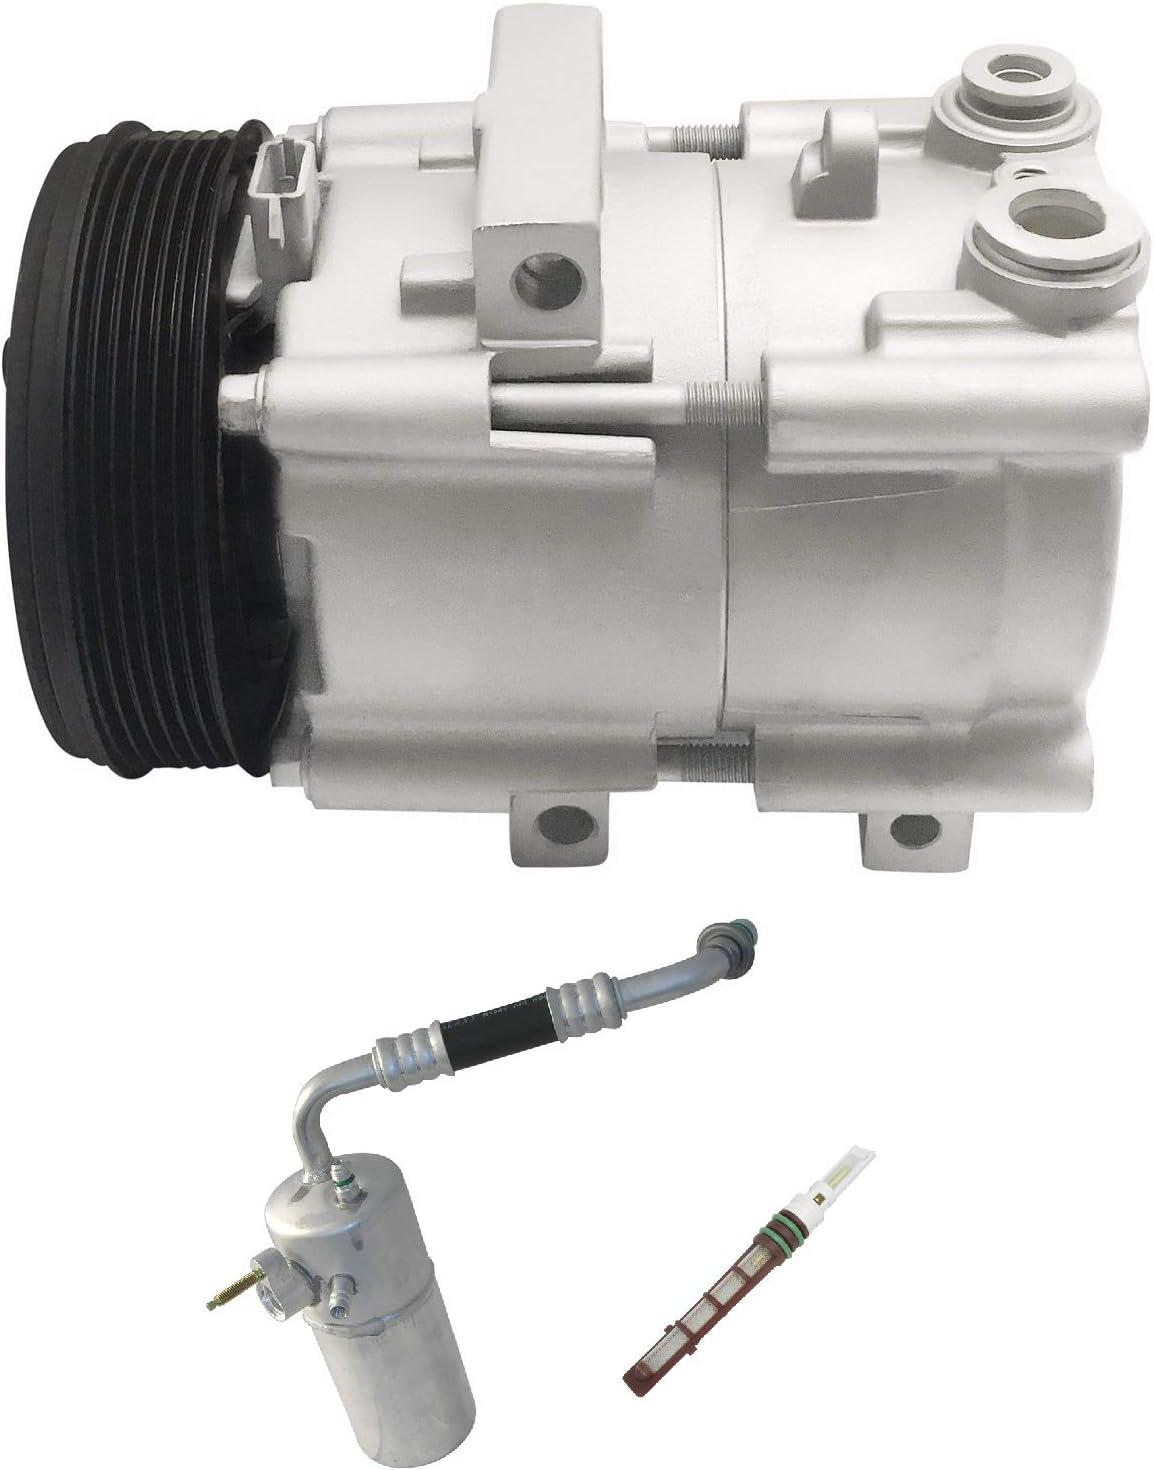 RYC Remanufactured AC Compressor Kit KT DA08